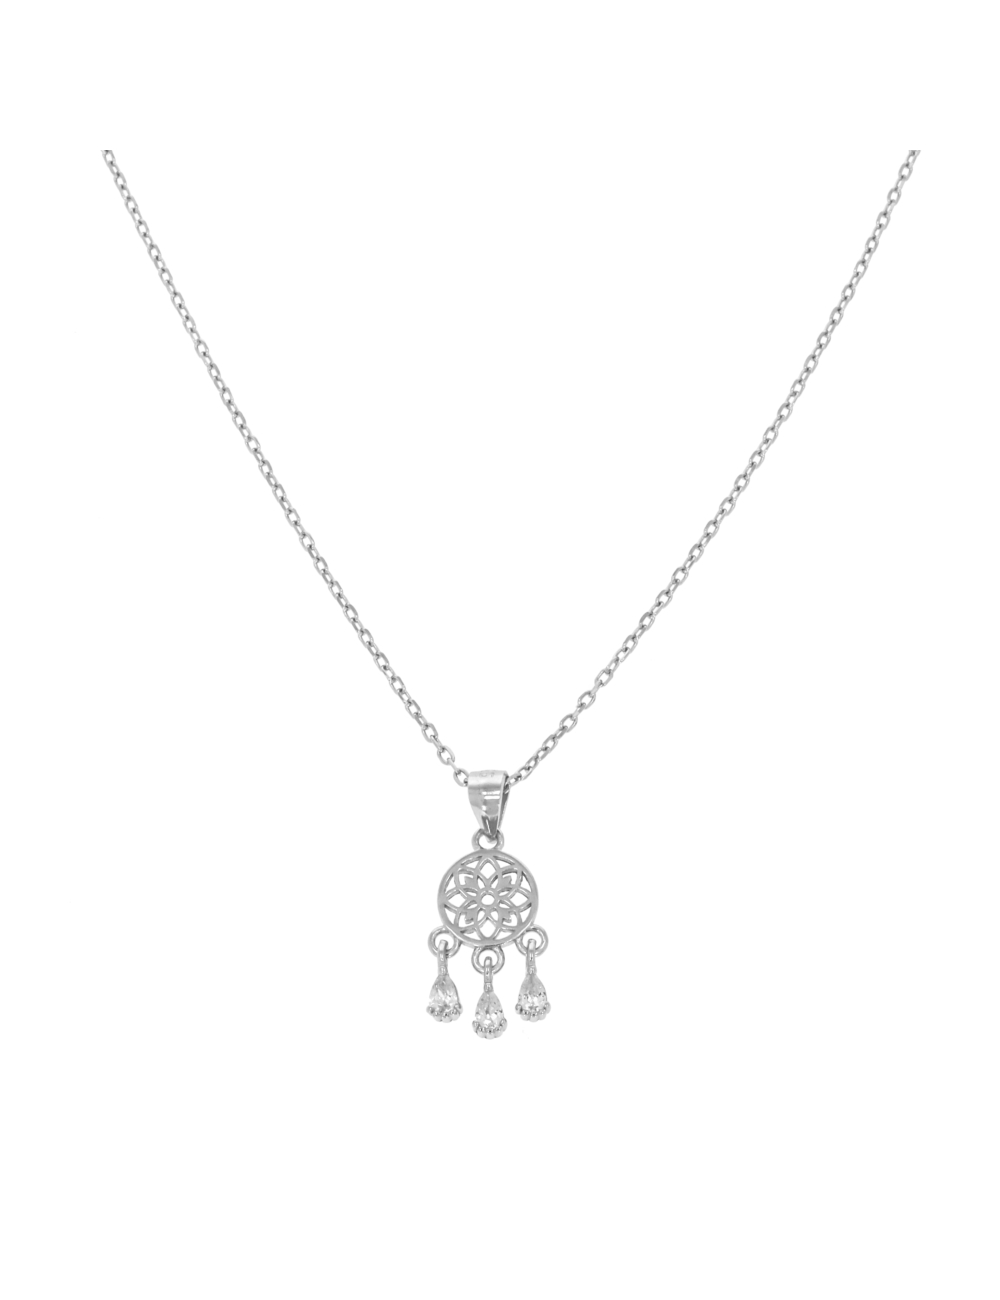 10012368 Naszyjnik srebrny pr.925 z cyrkoniami